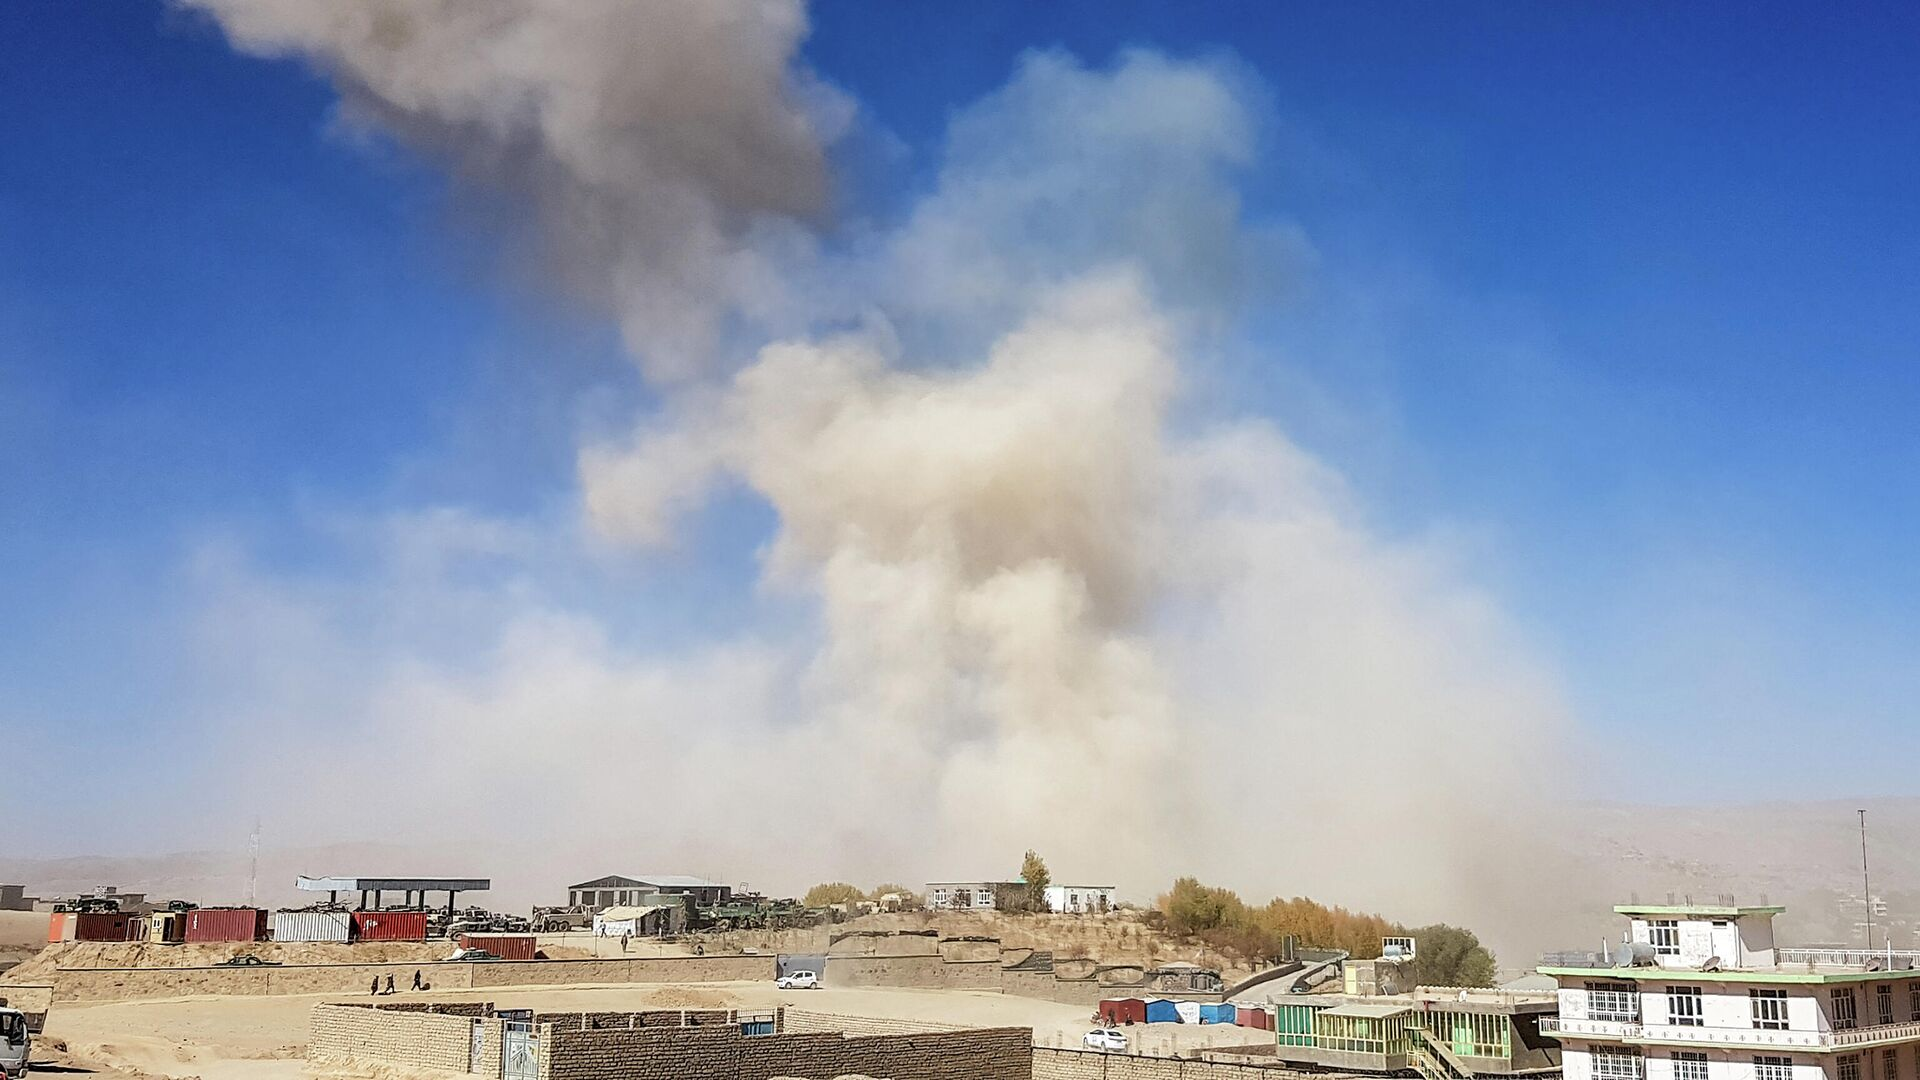 Дым от взрыва автомобиля в провинции Гор на западе Афганистана - РИА Новости, 1920, 18.10.2020